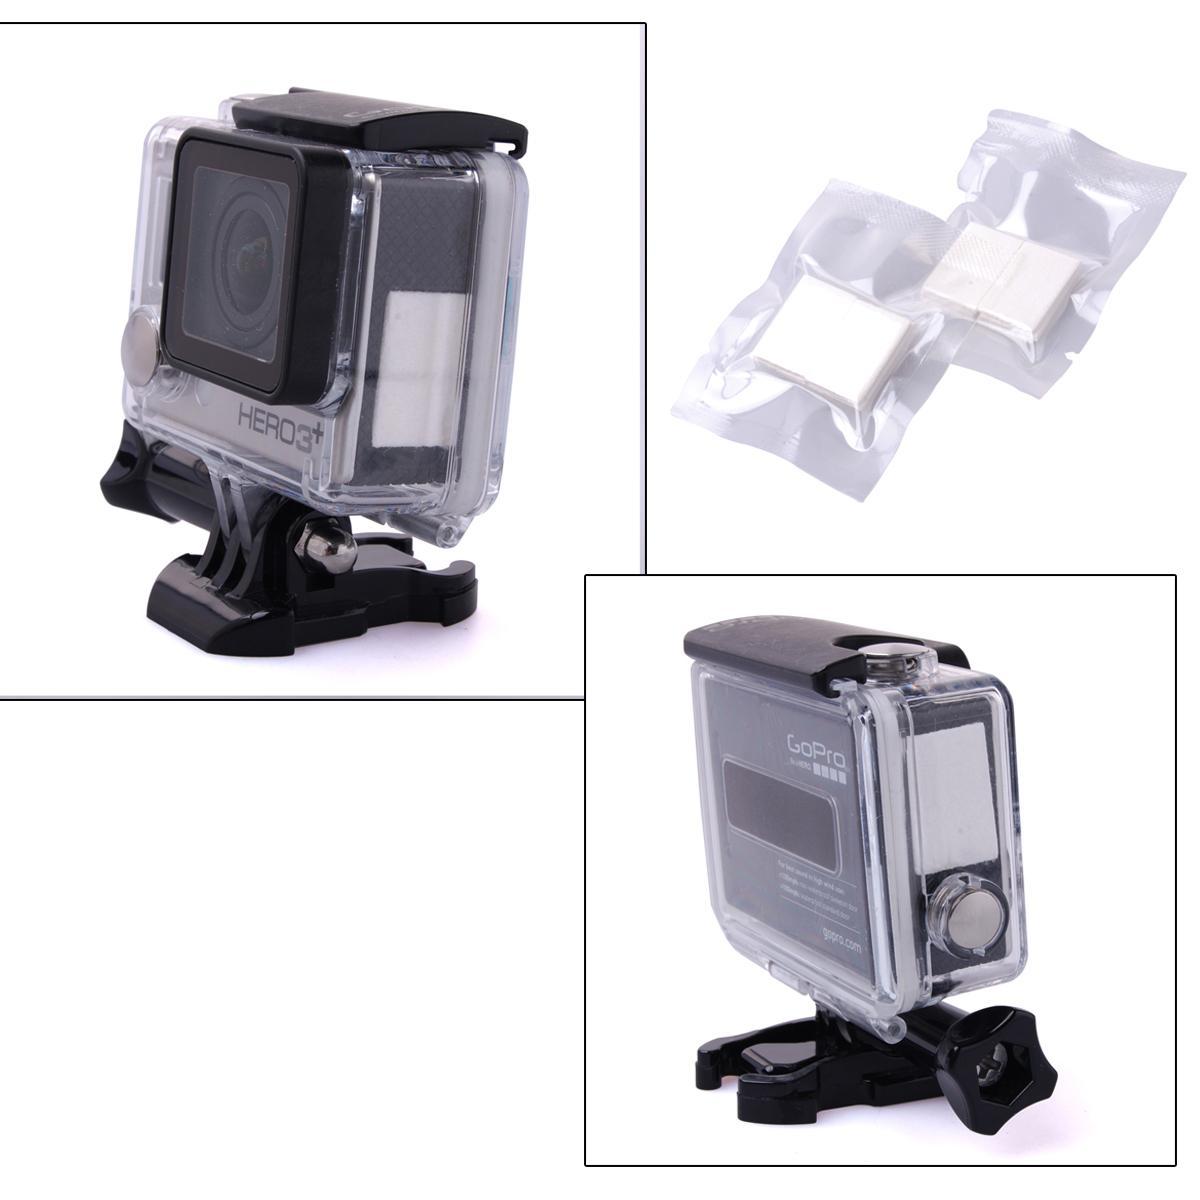 Kelebihan Sj4000 Full Hd Helmet Waterproof Action Camera With Strap Sport Cam Dv 1080p 12mp Kogan Detail Gambar Extra Battery Lf556 Terbaru